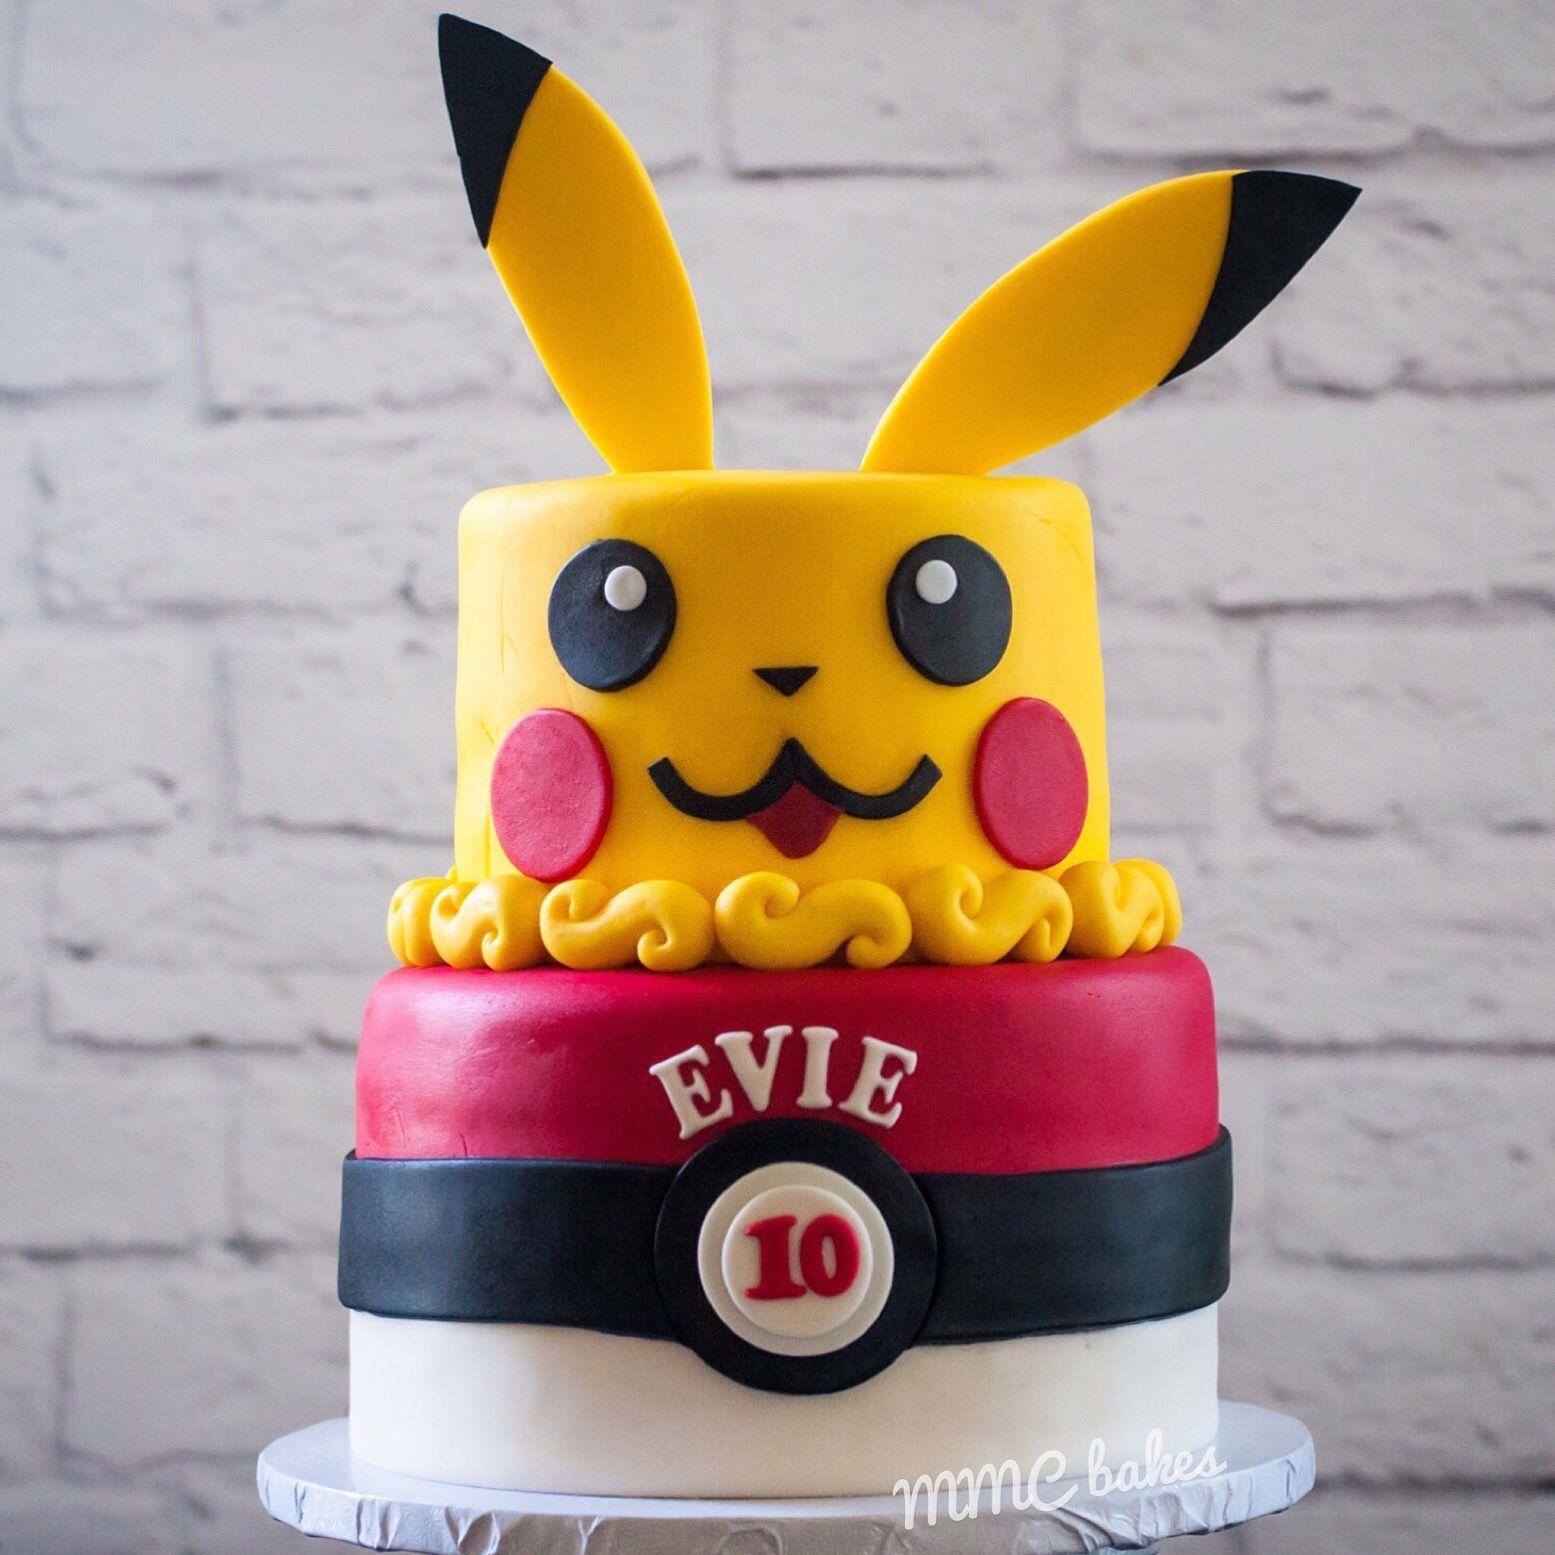 Pikachu pokemon cake fondant pokemongo cake custom cakes by mmc